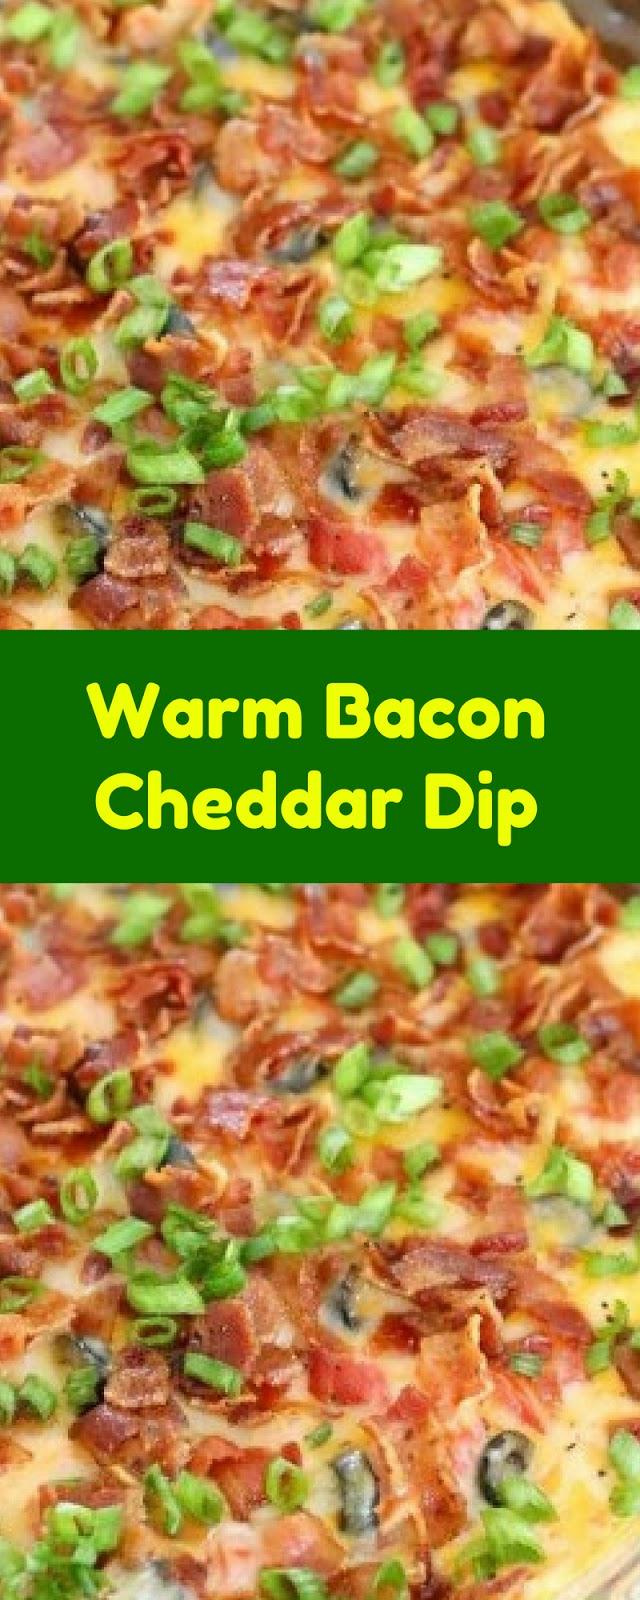 Warm Bacon Cheddar Dip - Cookies Cooking Corner